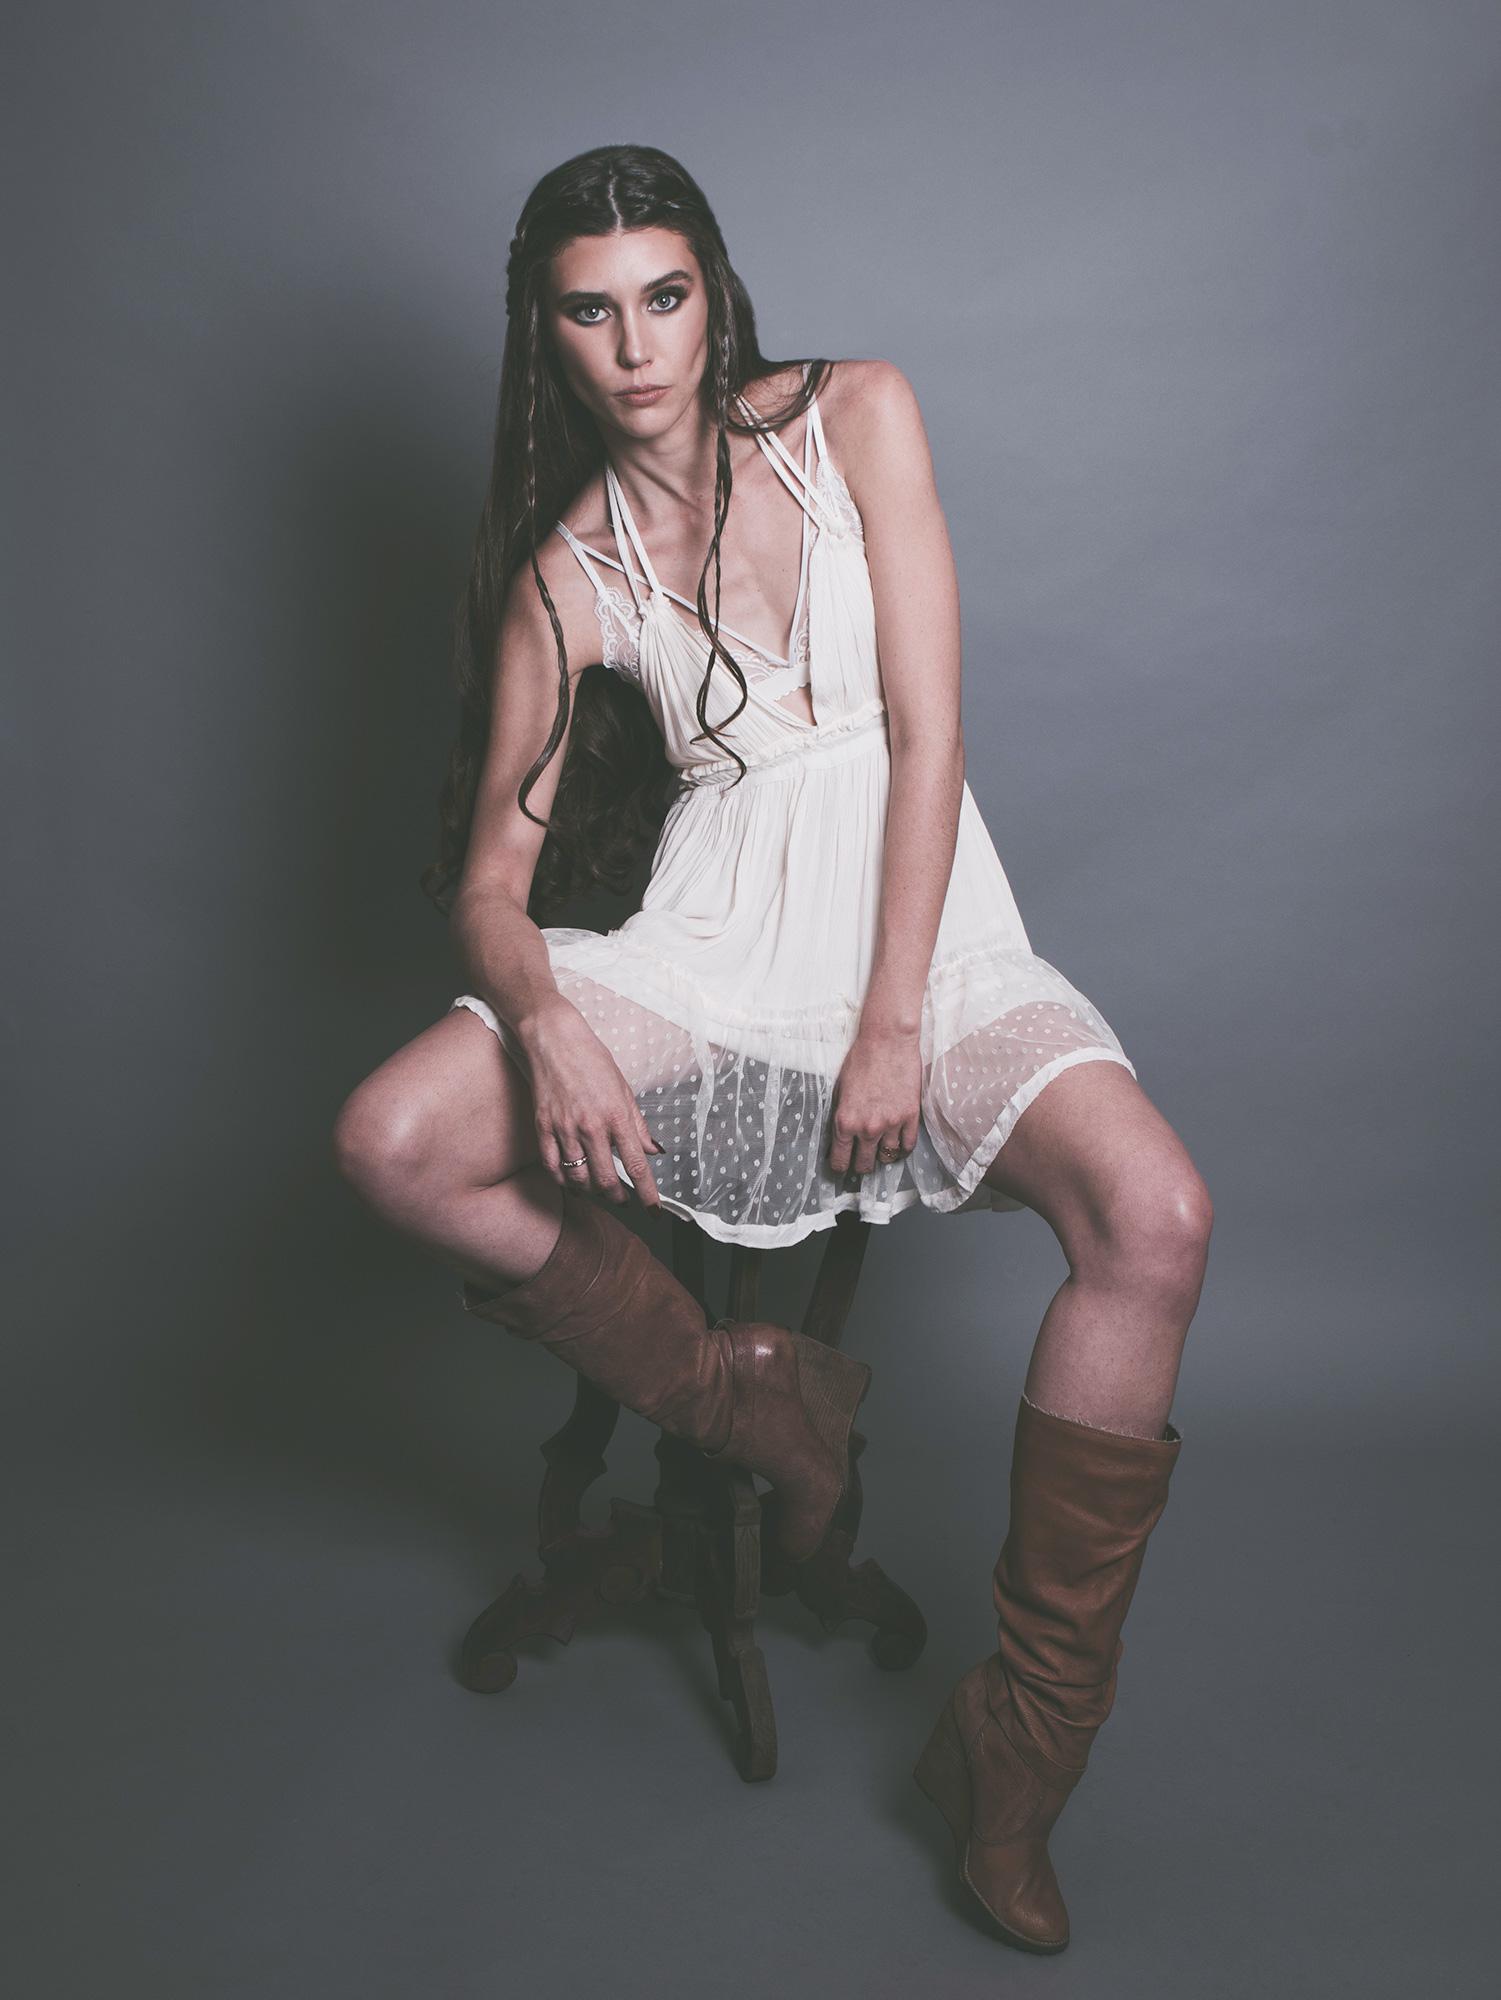 amora_beauty_studio_female_model_sitting_chair_white_dress_indie_rock_braids_country_miami.jpg